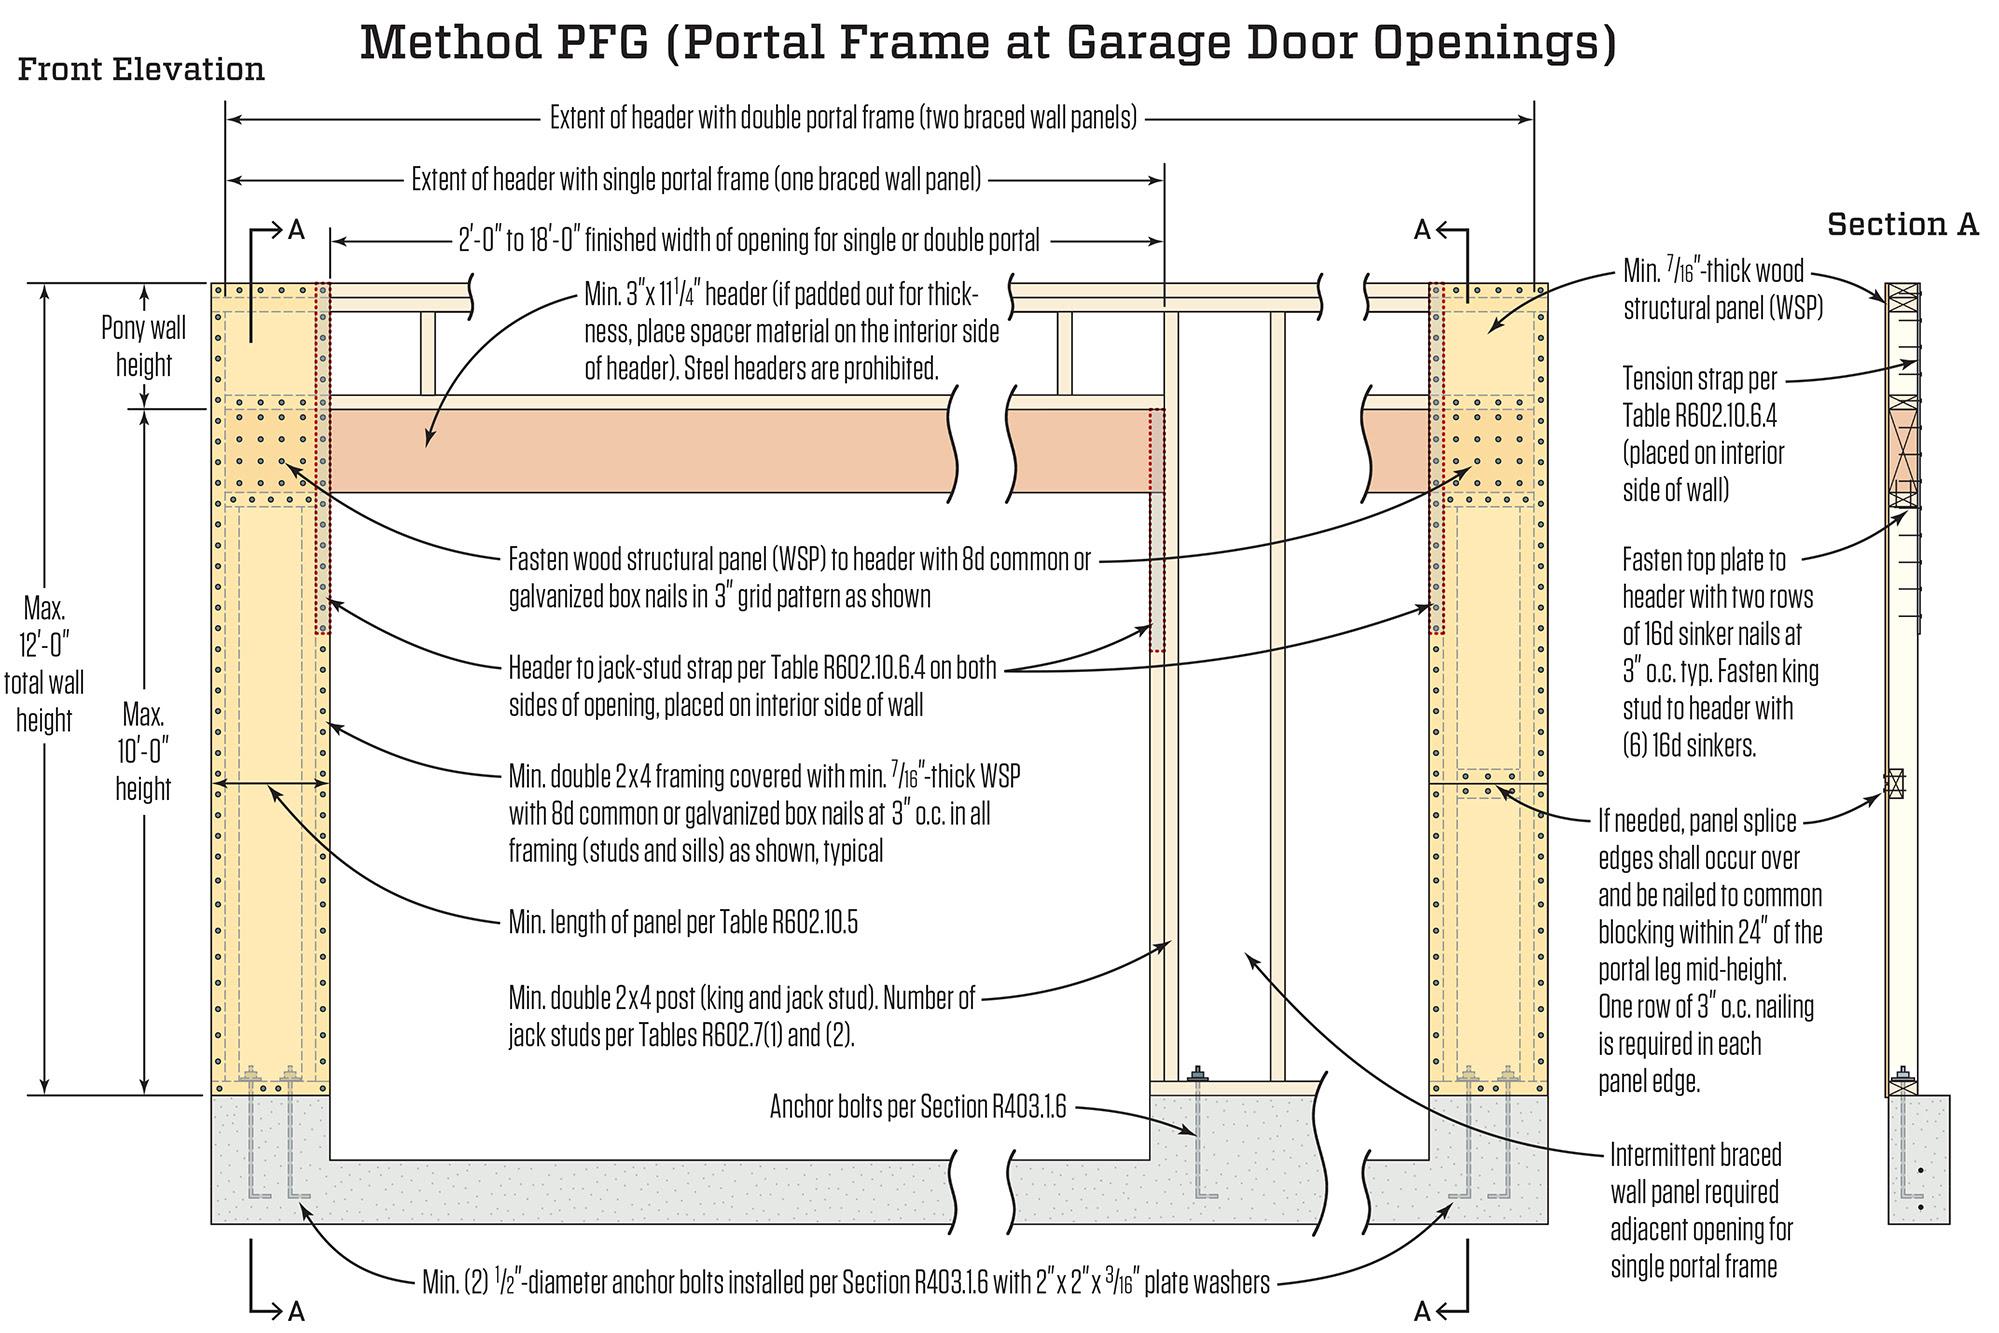 The Portal Frame Option Jlc Online Storm And Wind Resistance